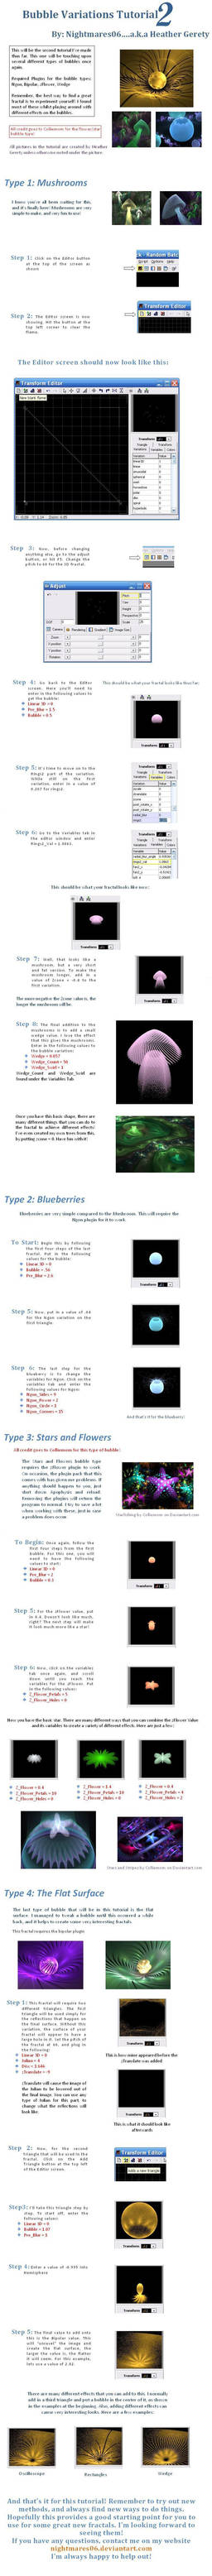 Bubble Variation Tutorial 2